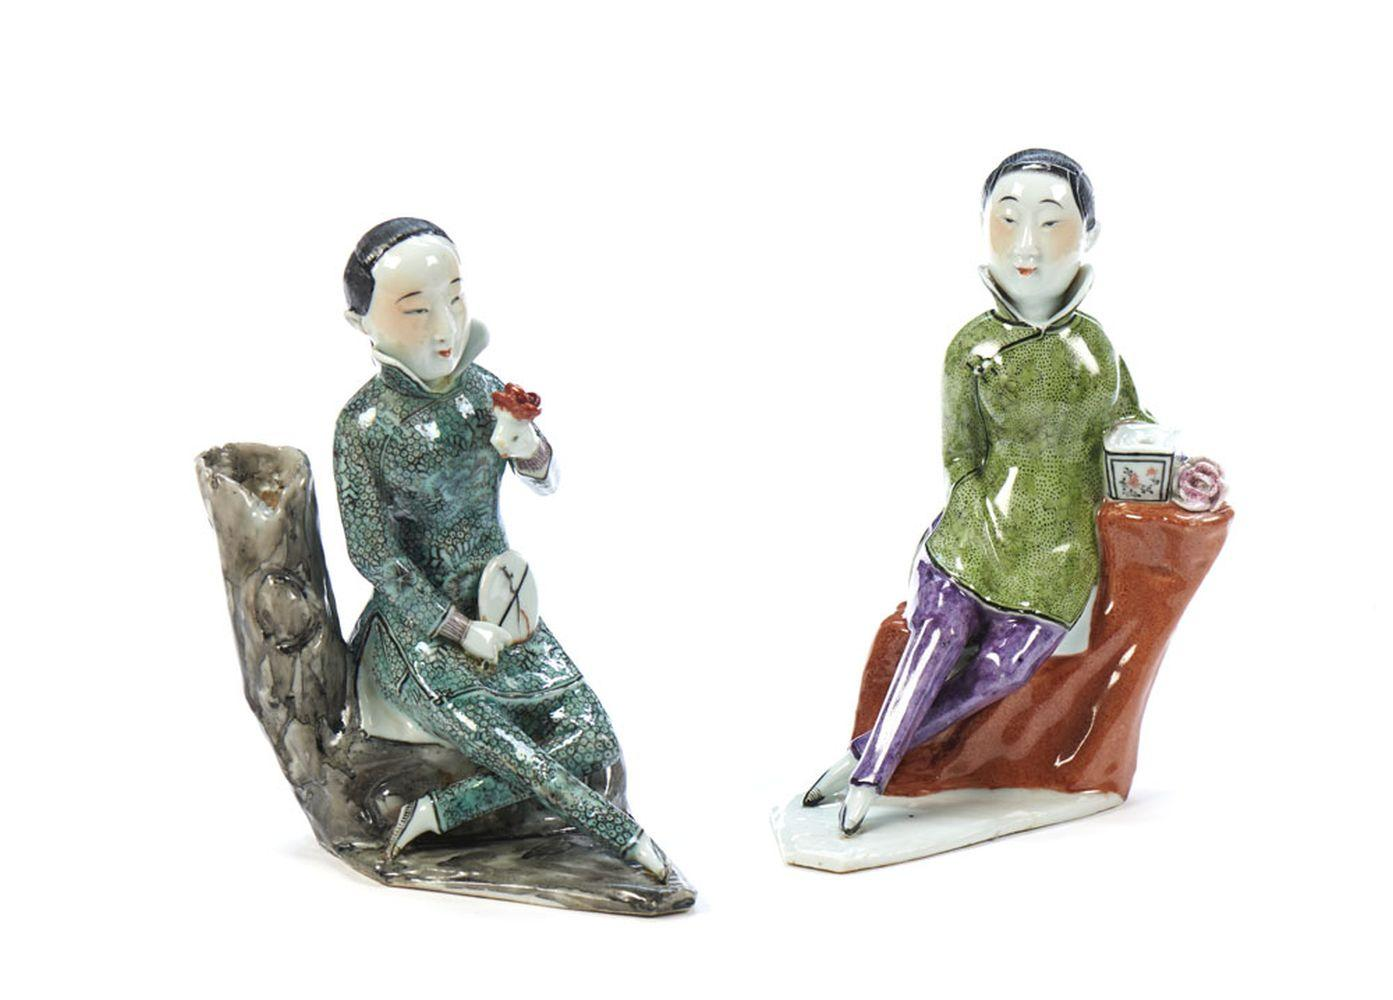 Figuras femininas sentadas, esculturas (2)